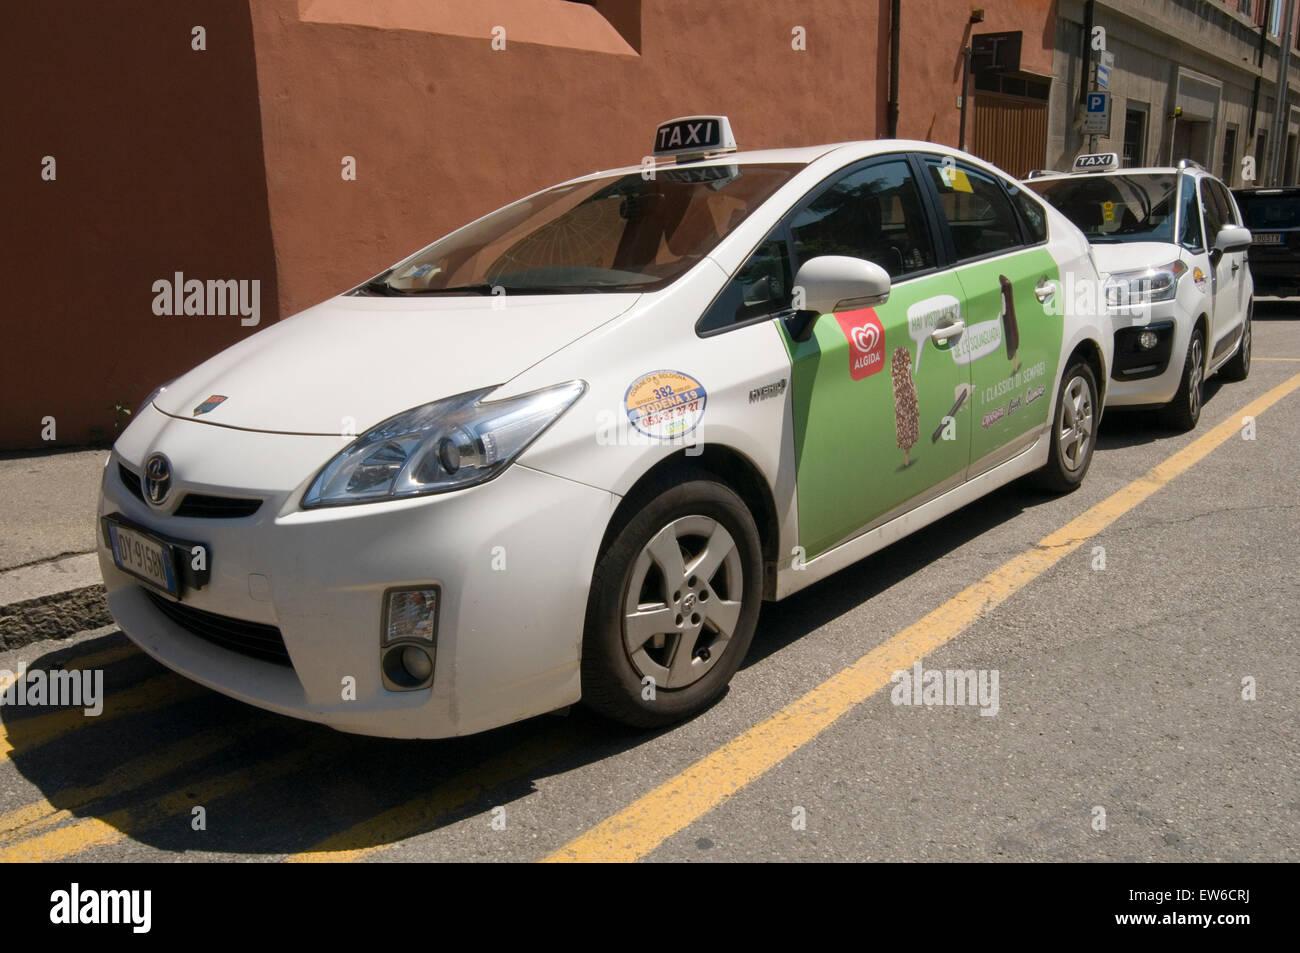 Prius híbrido de Toyota pirus hybred coche coches taxi japonés Imagen De Stock